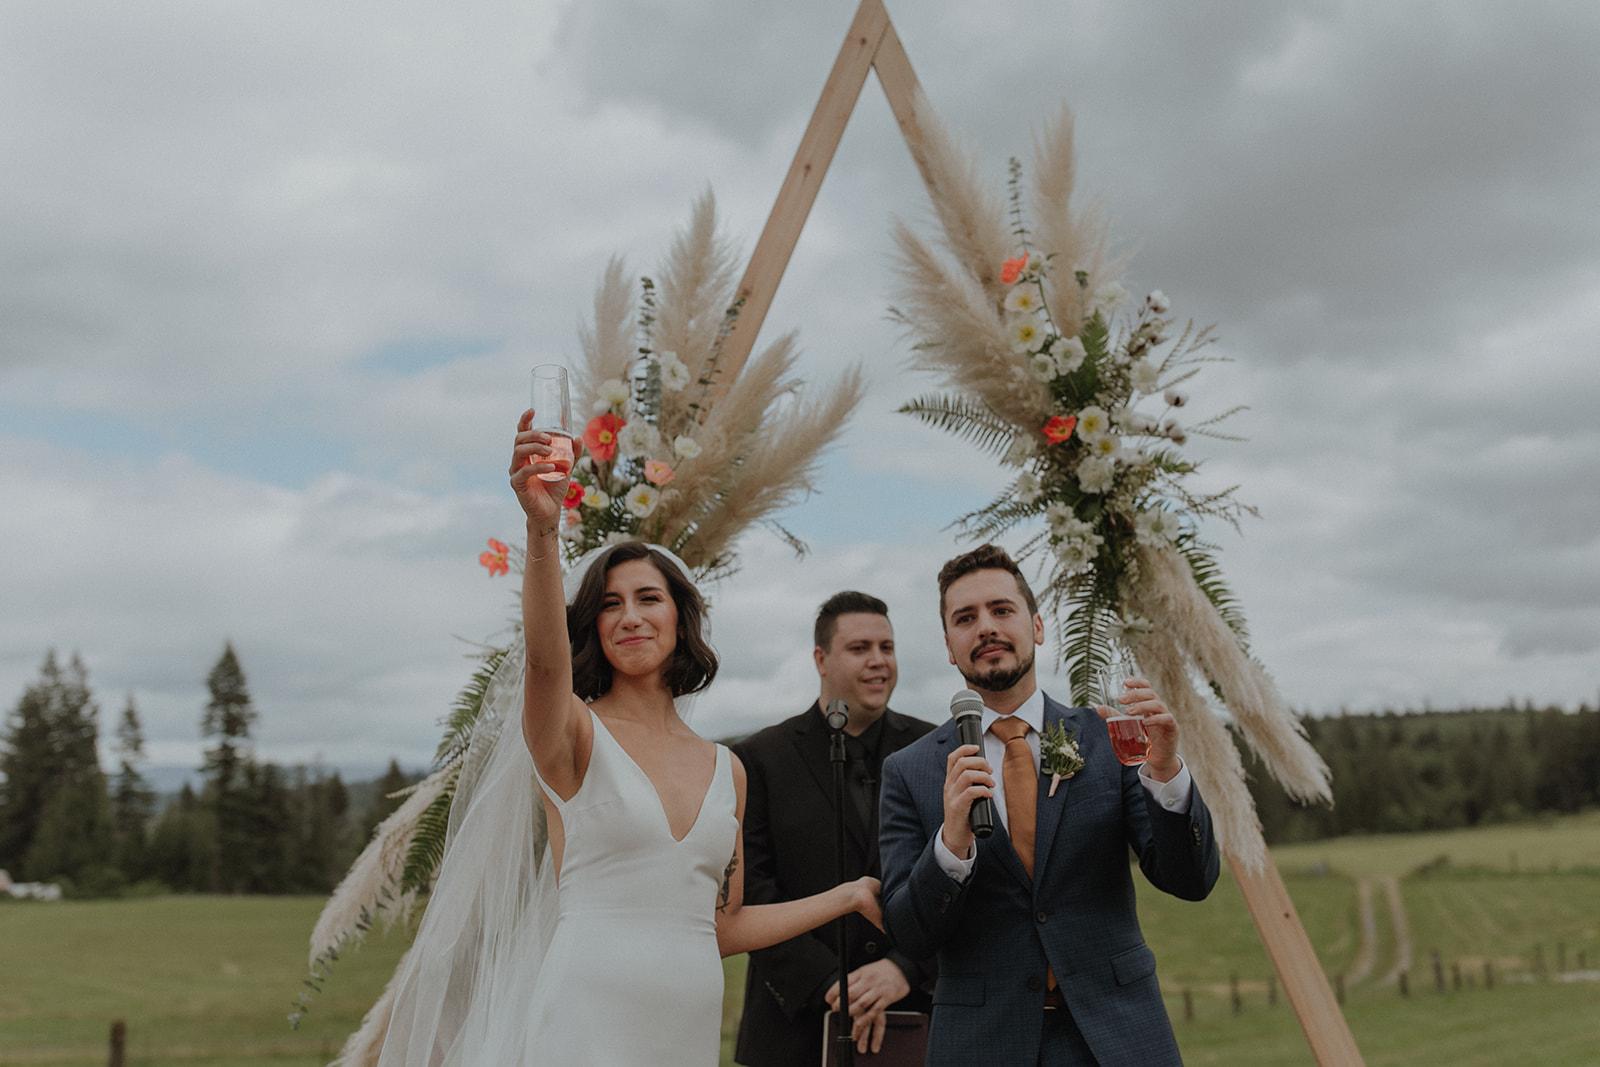 cortney_skye_wedding_june2019-390.jpg